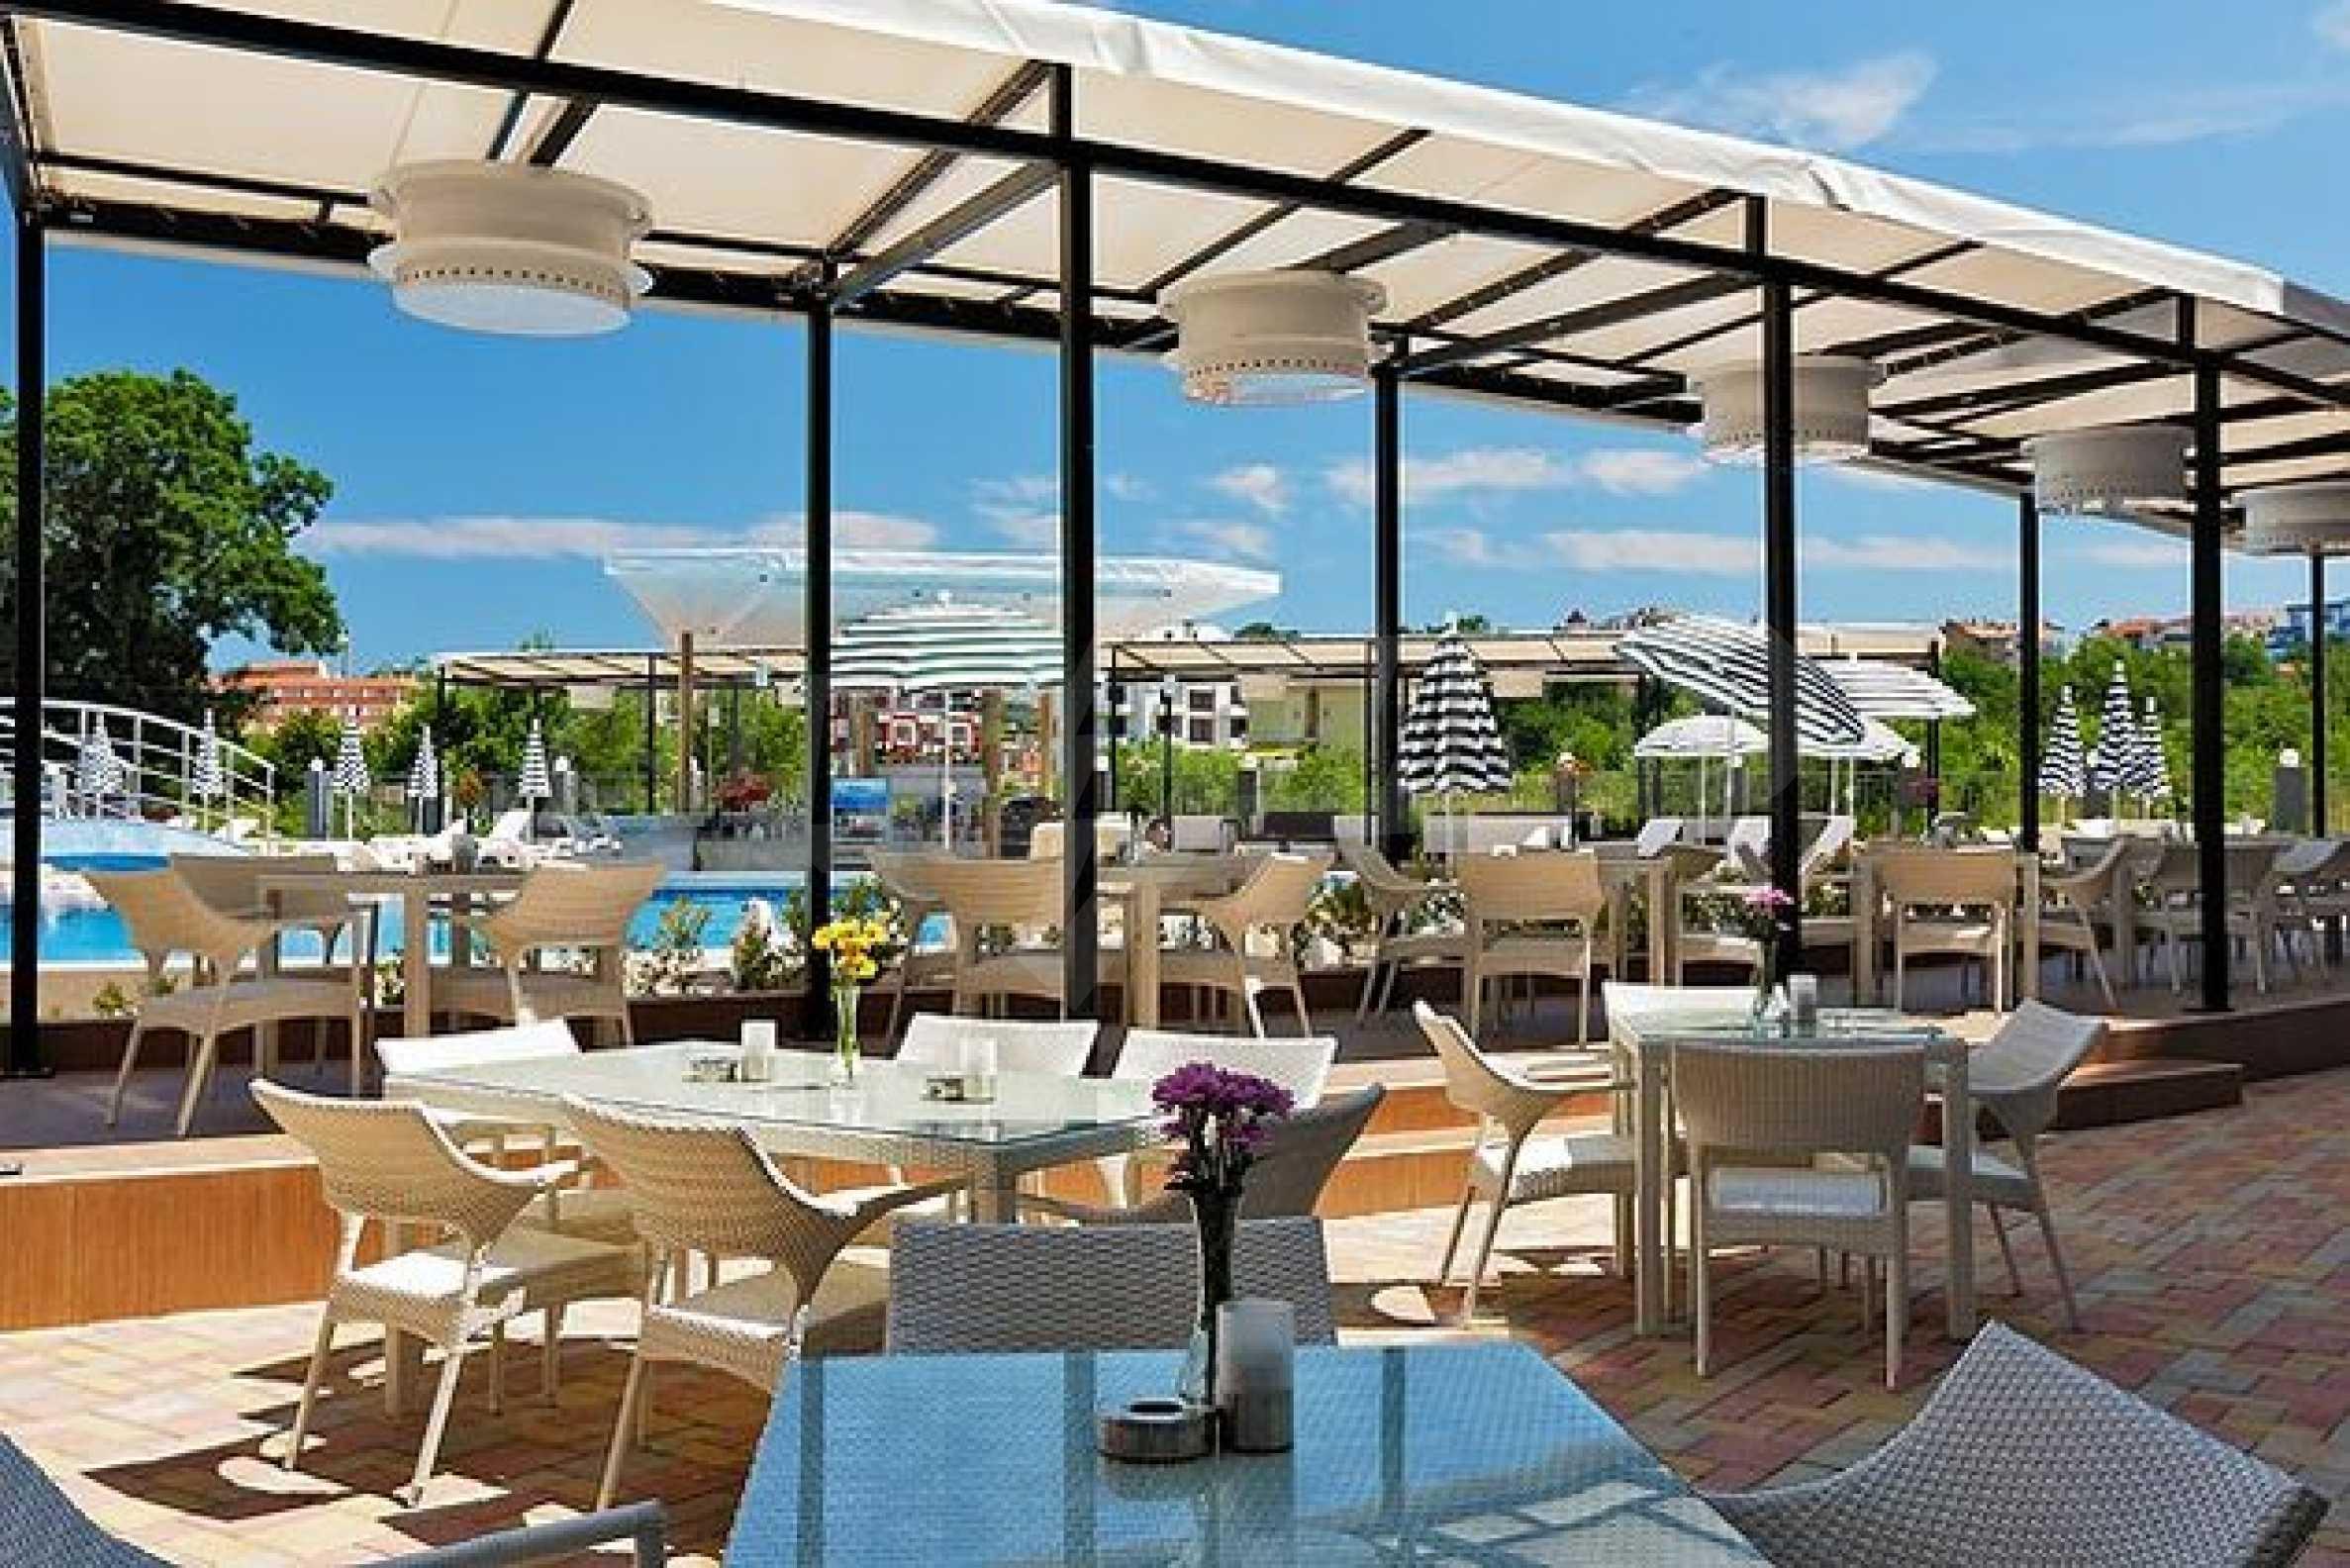 Emberli Park Bar & Diner in the beach resort of Lozenets 22